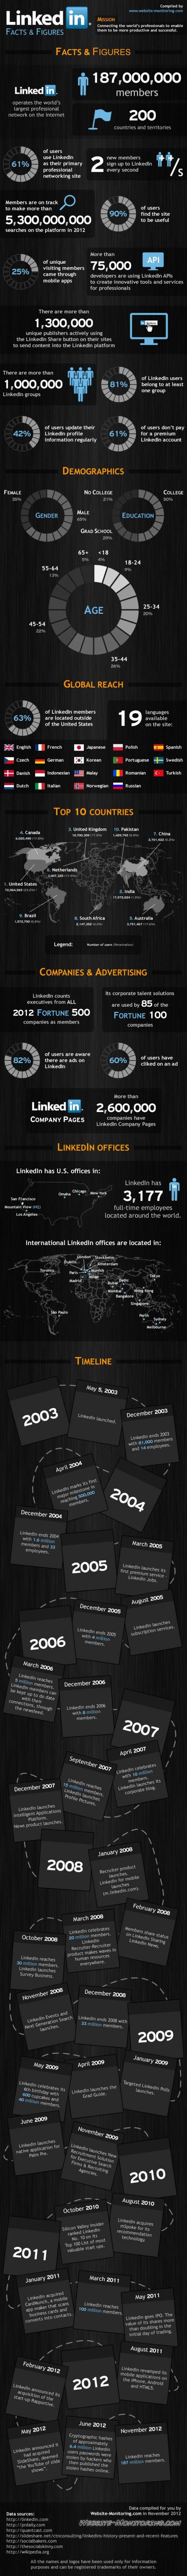 LinkedIn Facts Figures